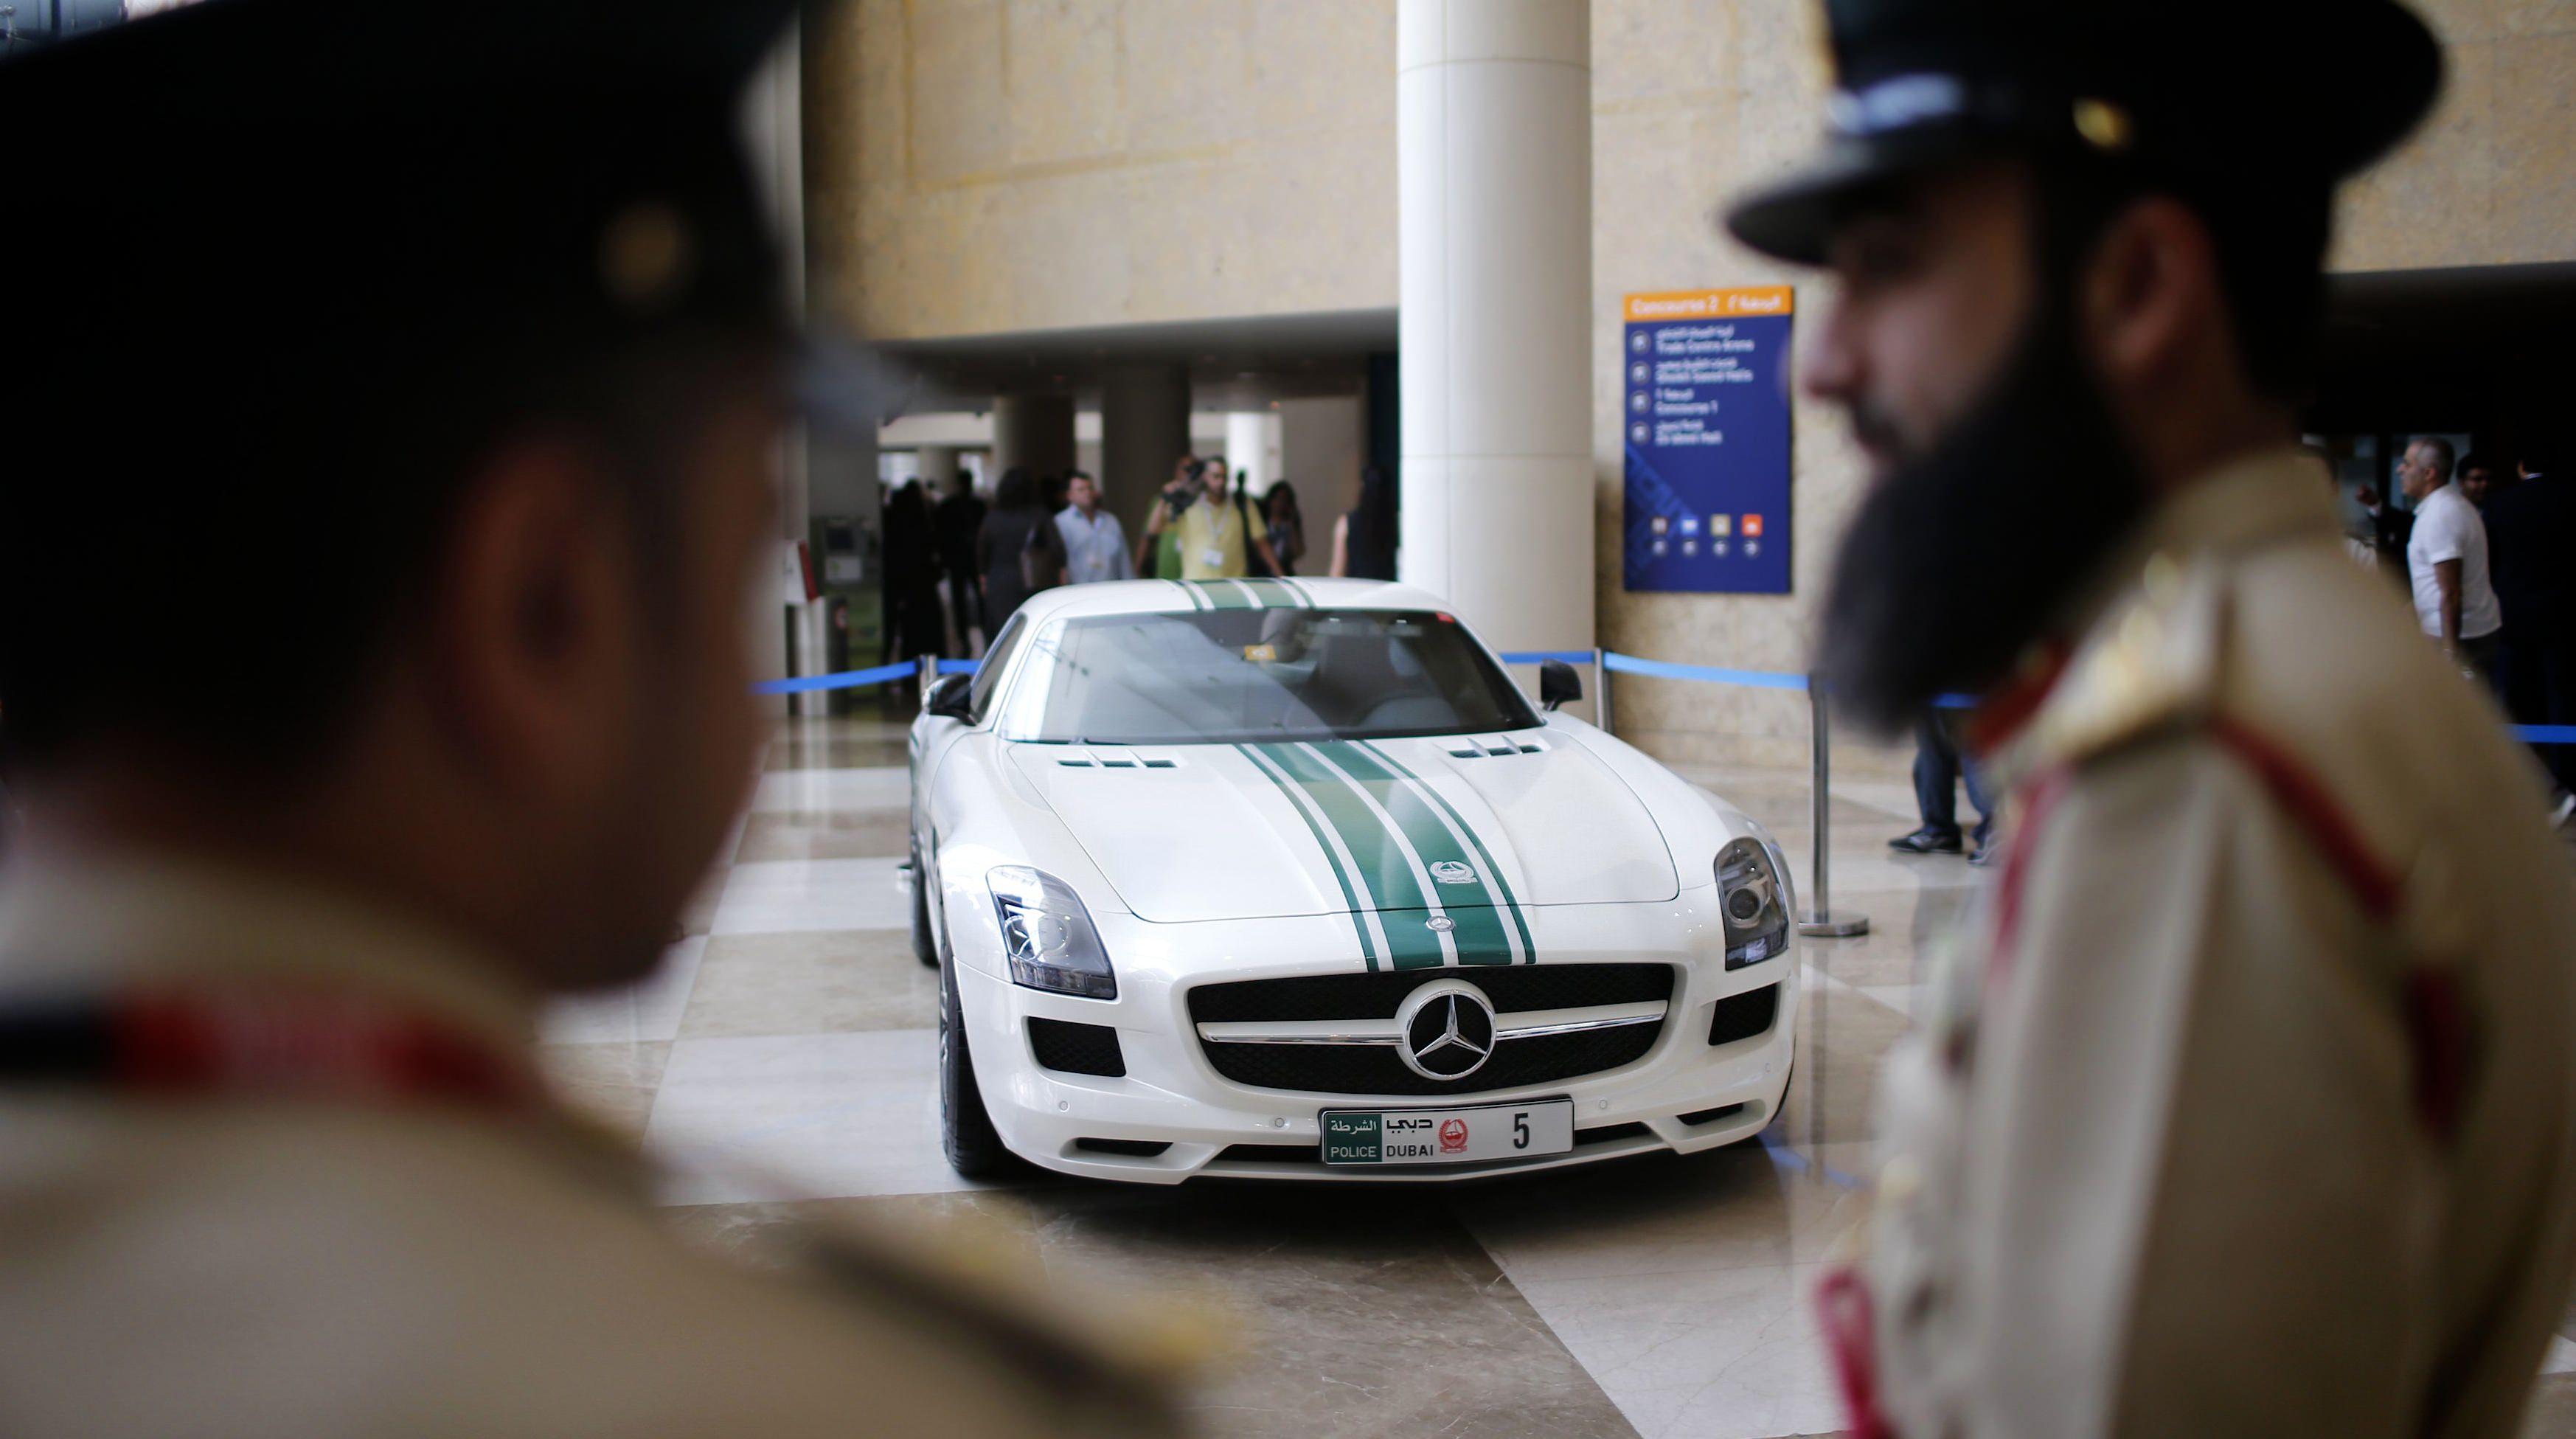 Island Detail And Color | Dubai Police 2